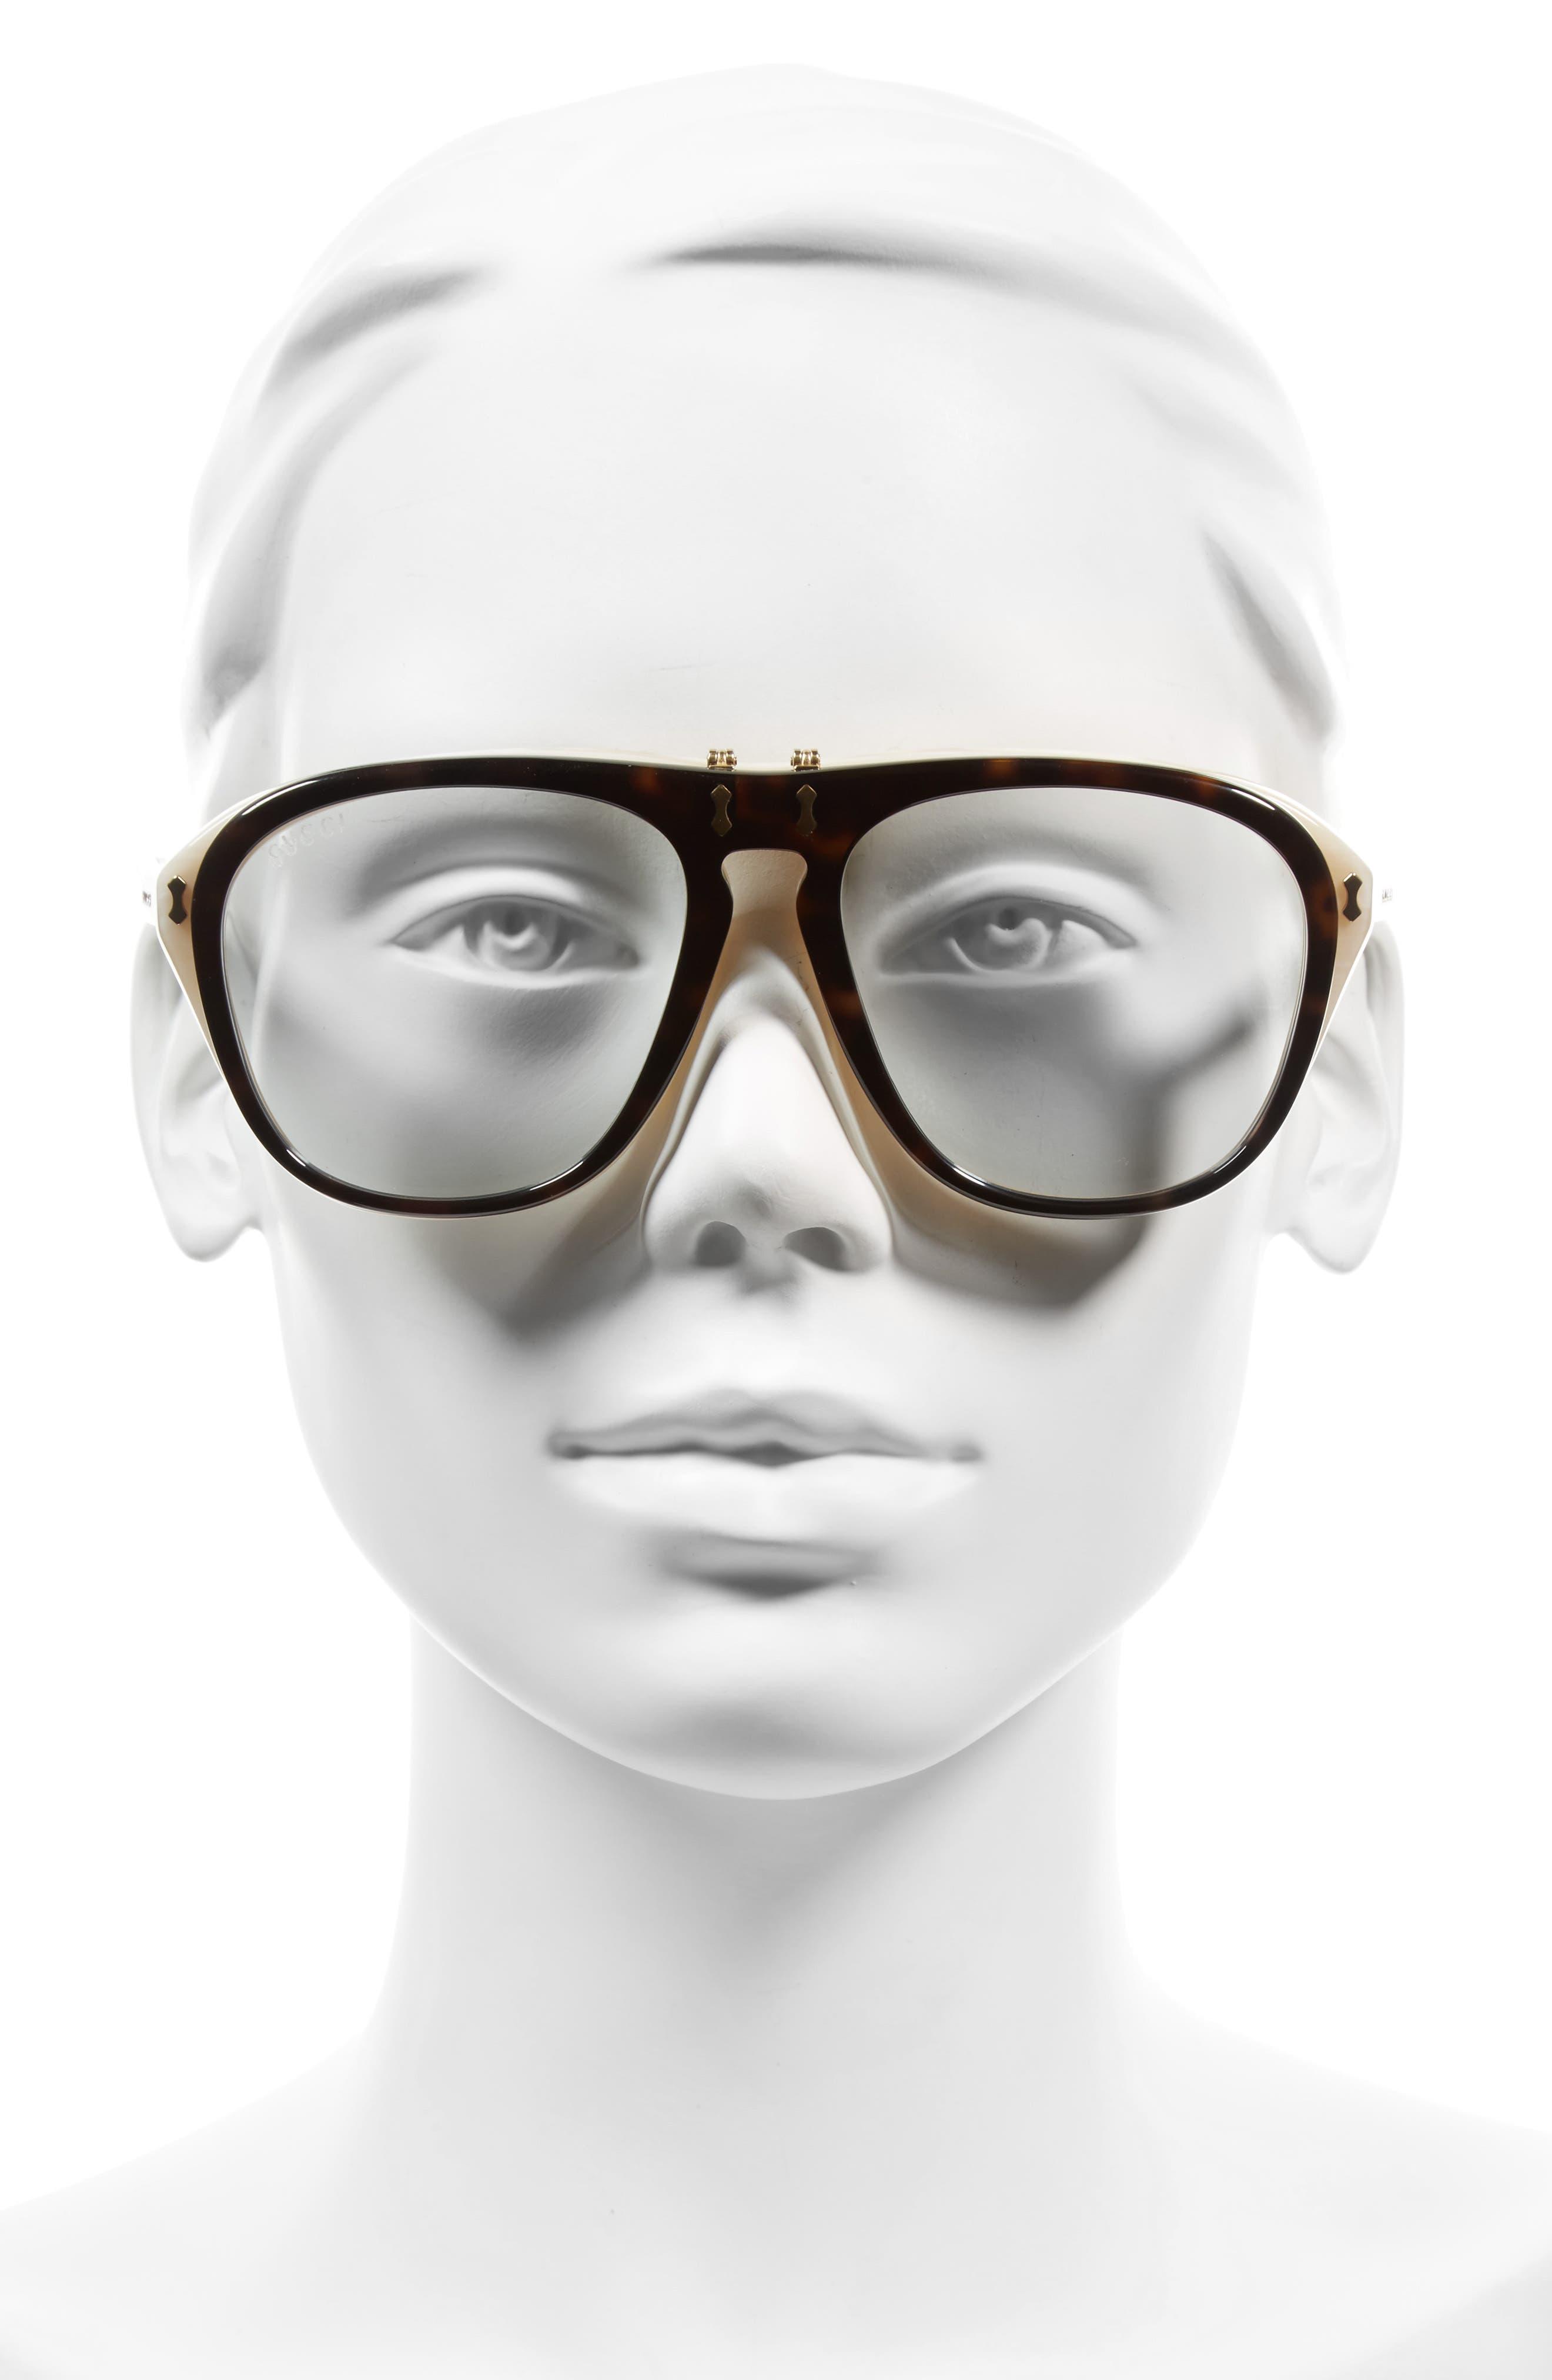 56mm Flip-Up Sunglasses,                             Alternate thumbnail 2, color,                             200